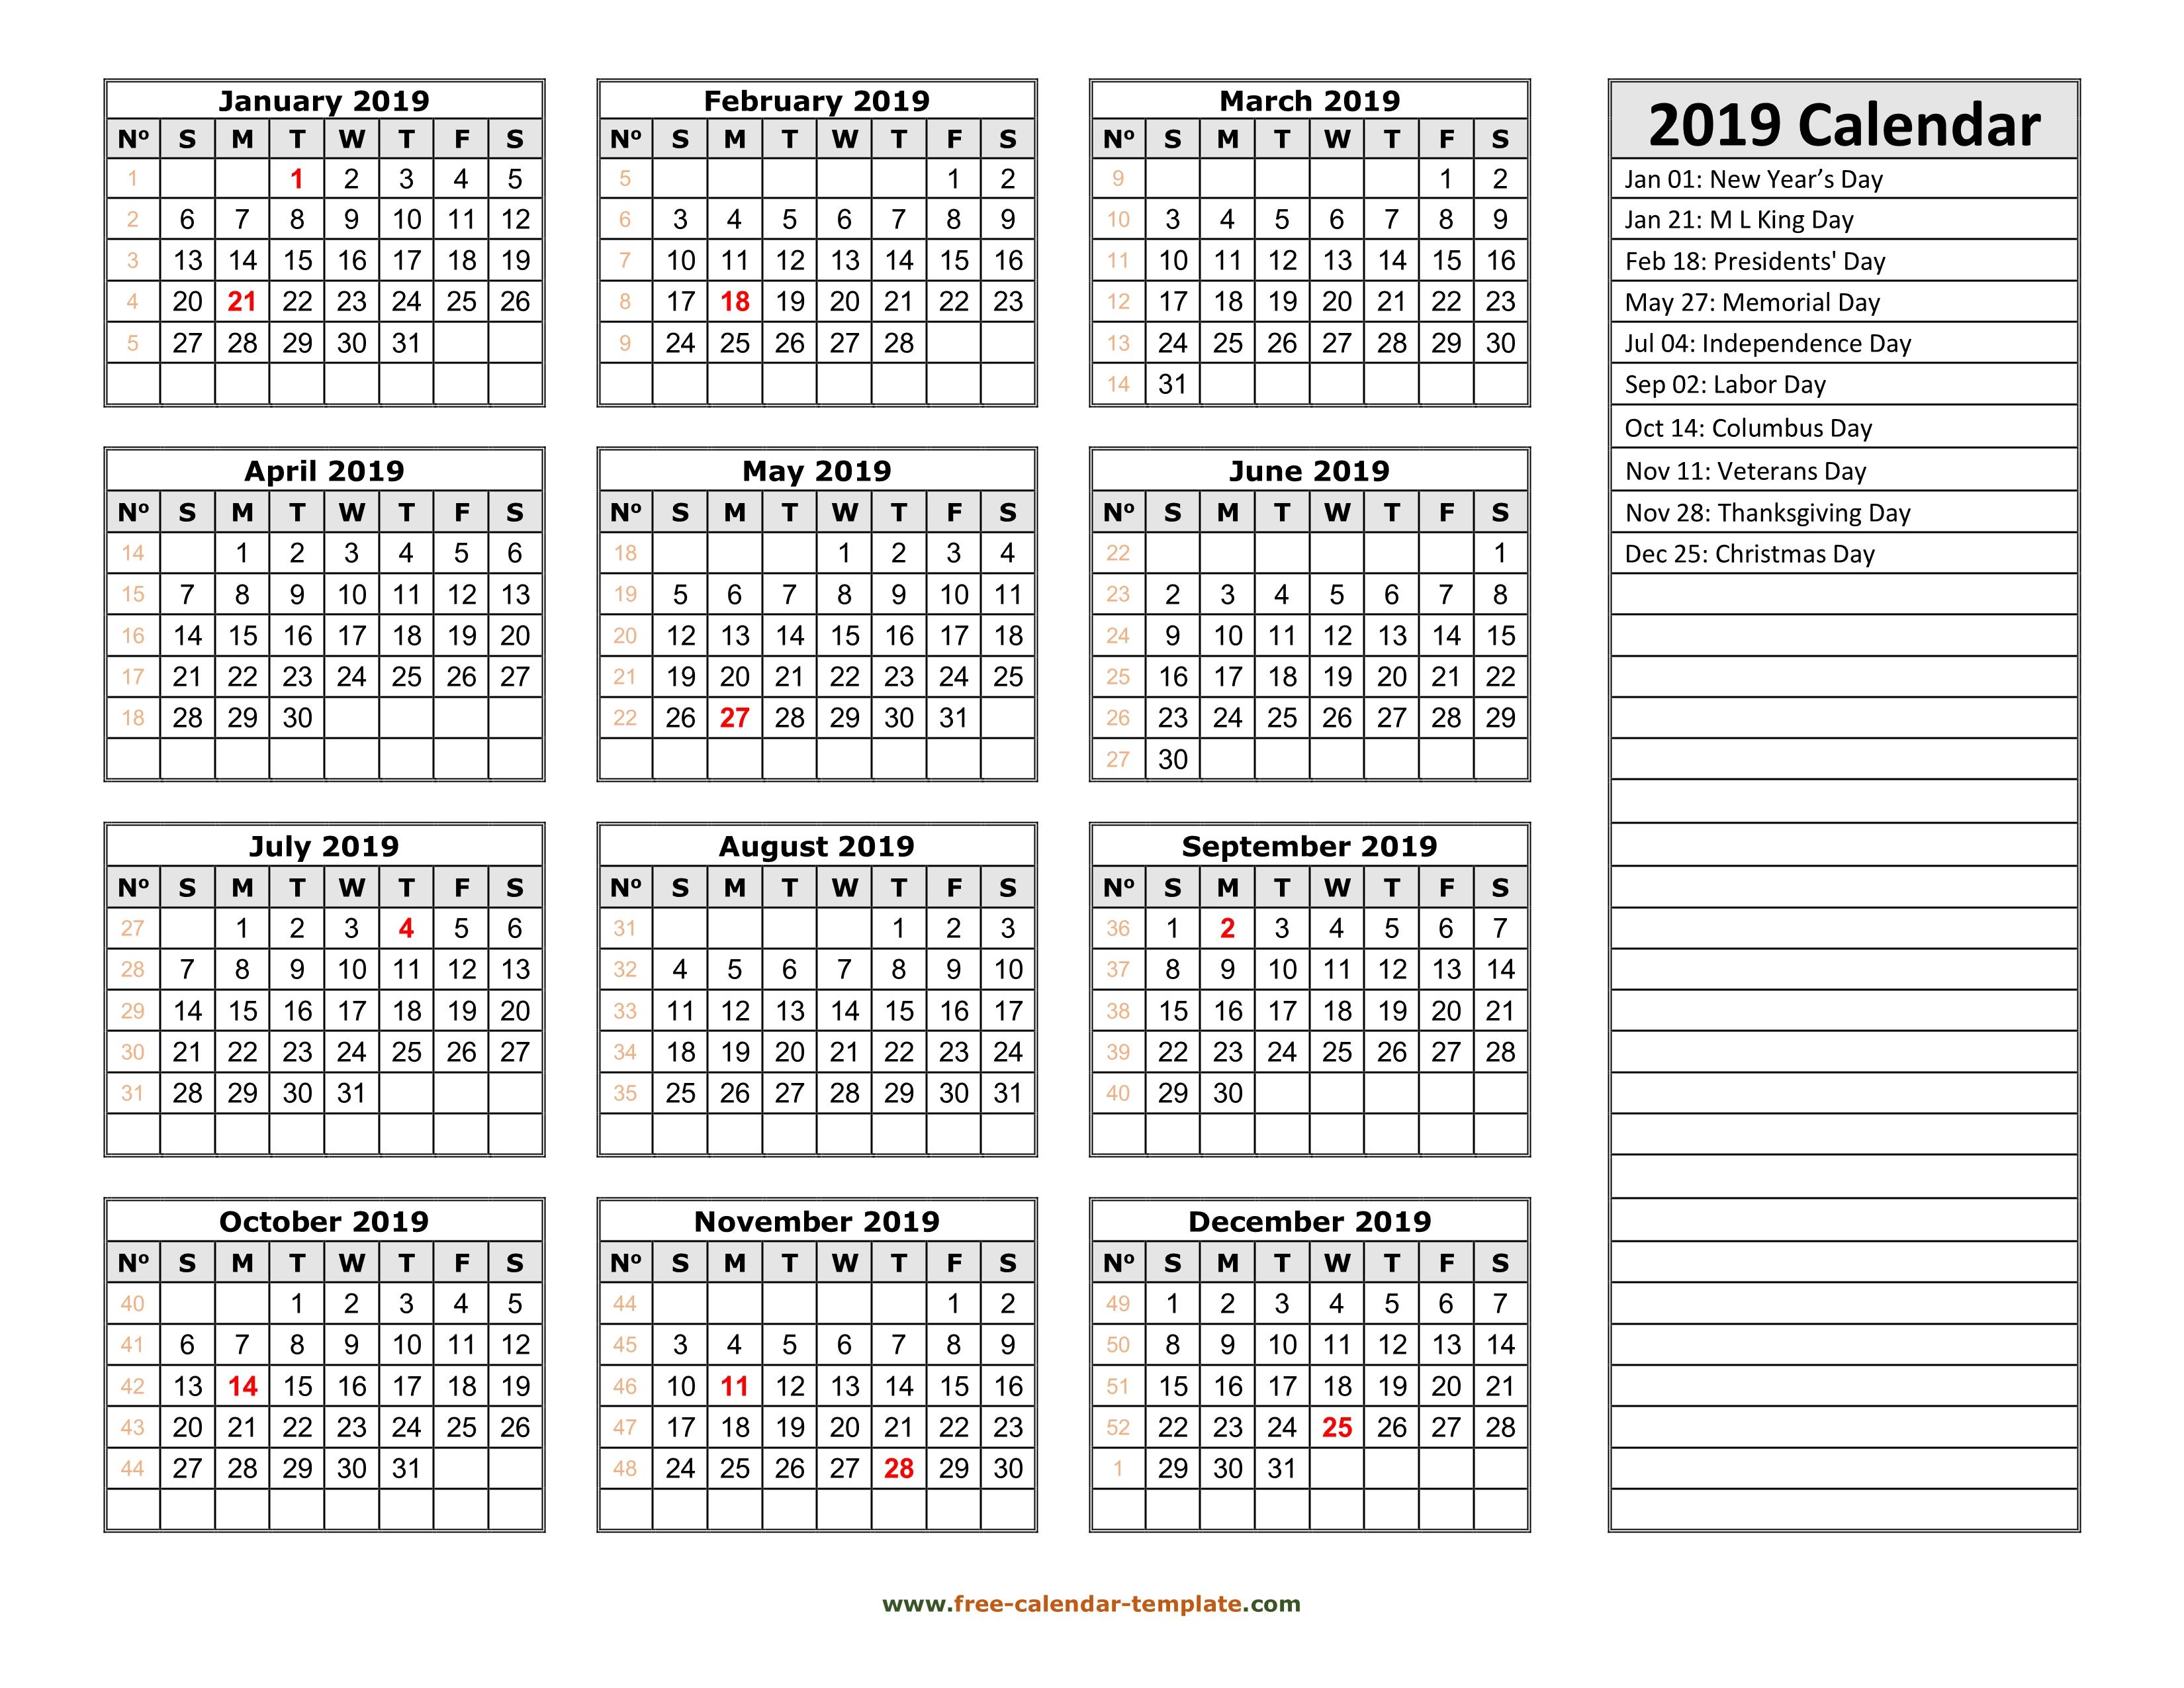 2019 Yearly Calendar Printable With Week Numbers | Free